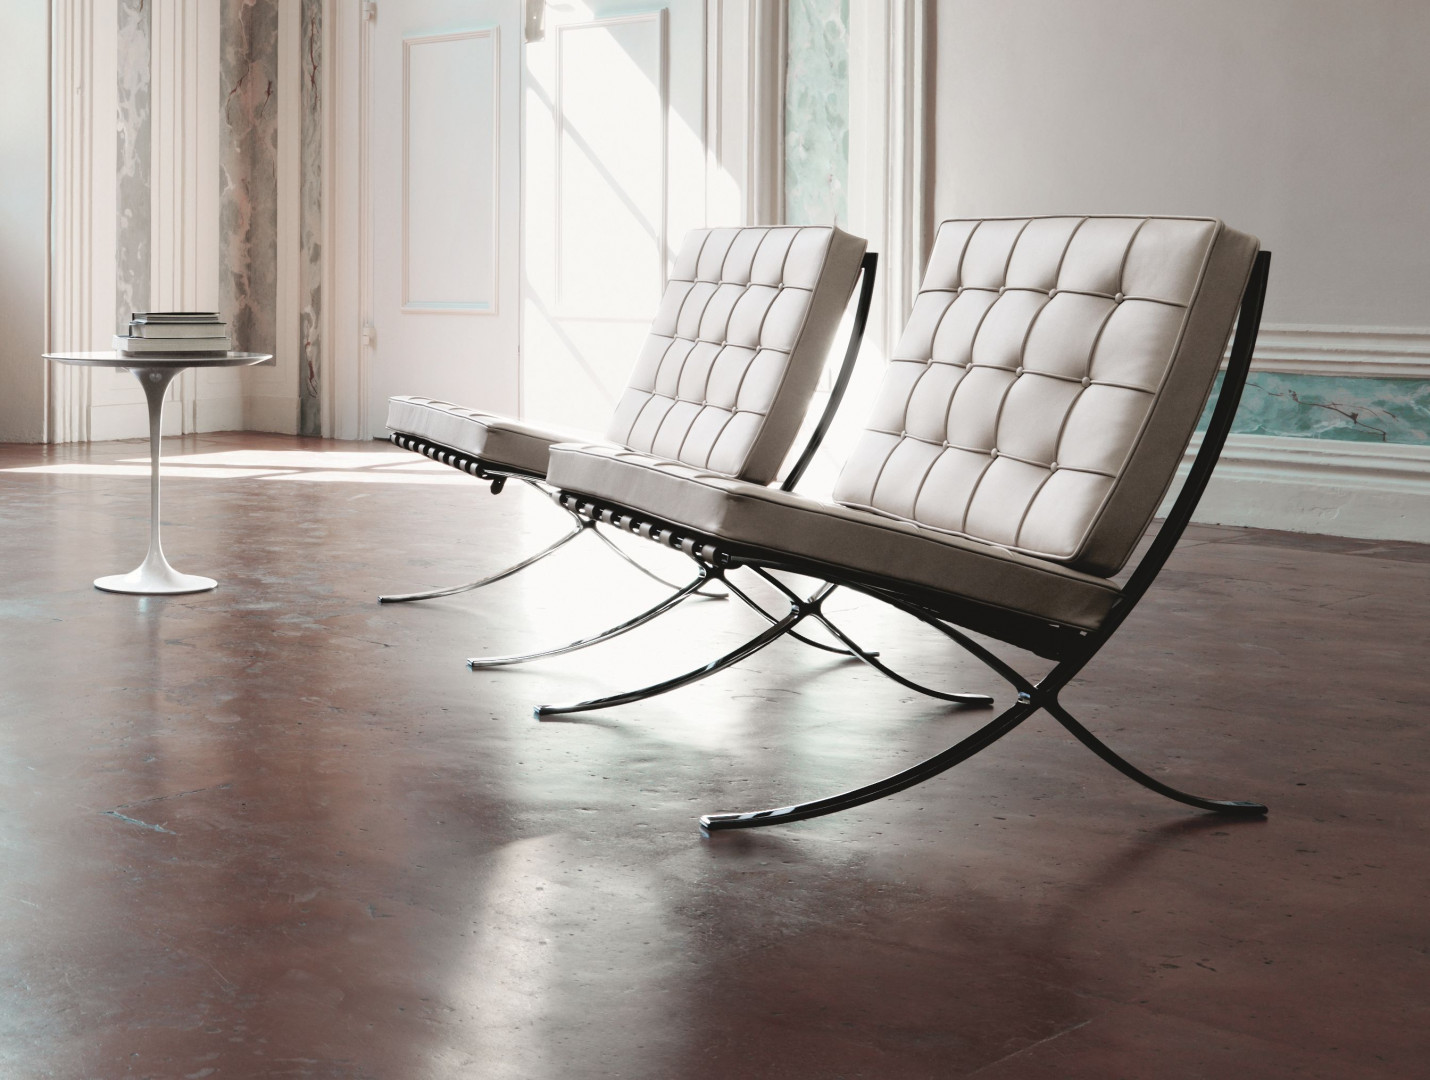 Barcelona Chair - mebel zaprojektowany przez Miesa van der Rohe. Fot. Walter Knoll